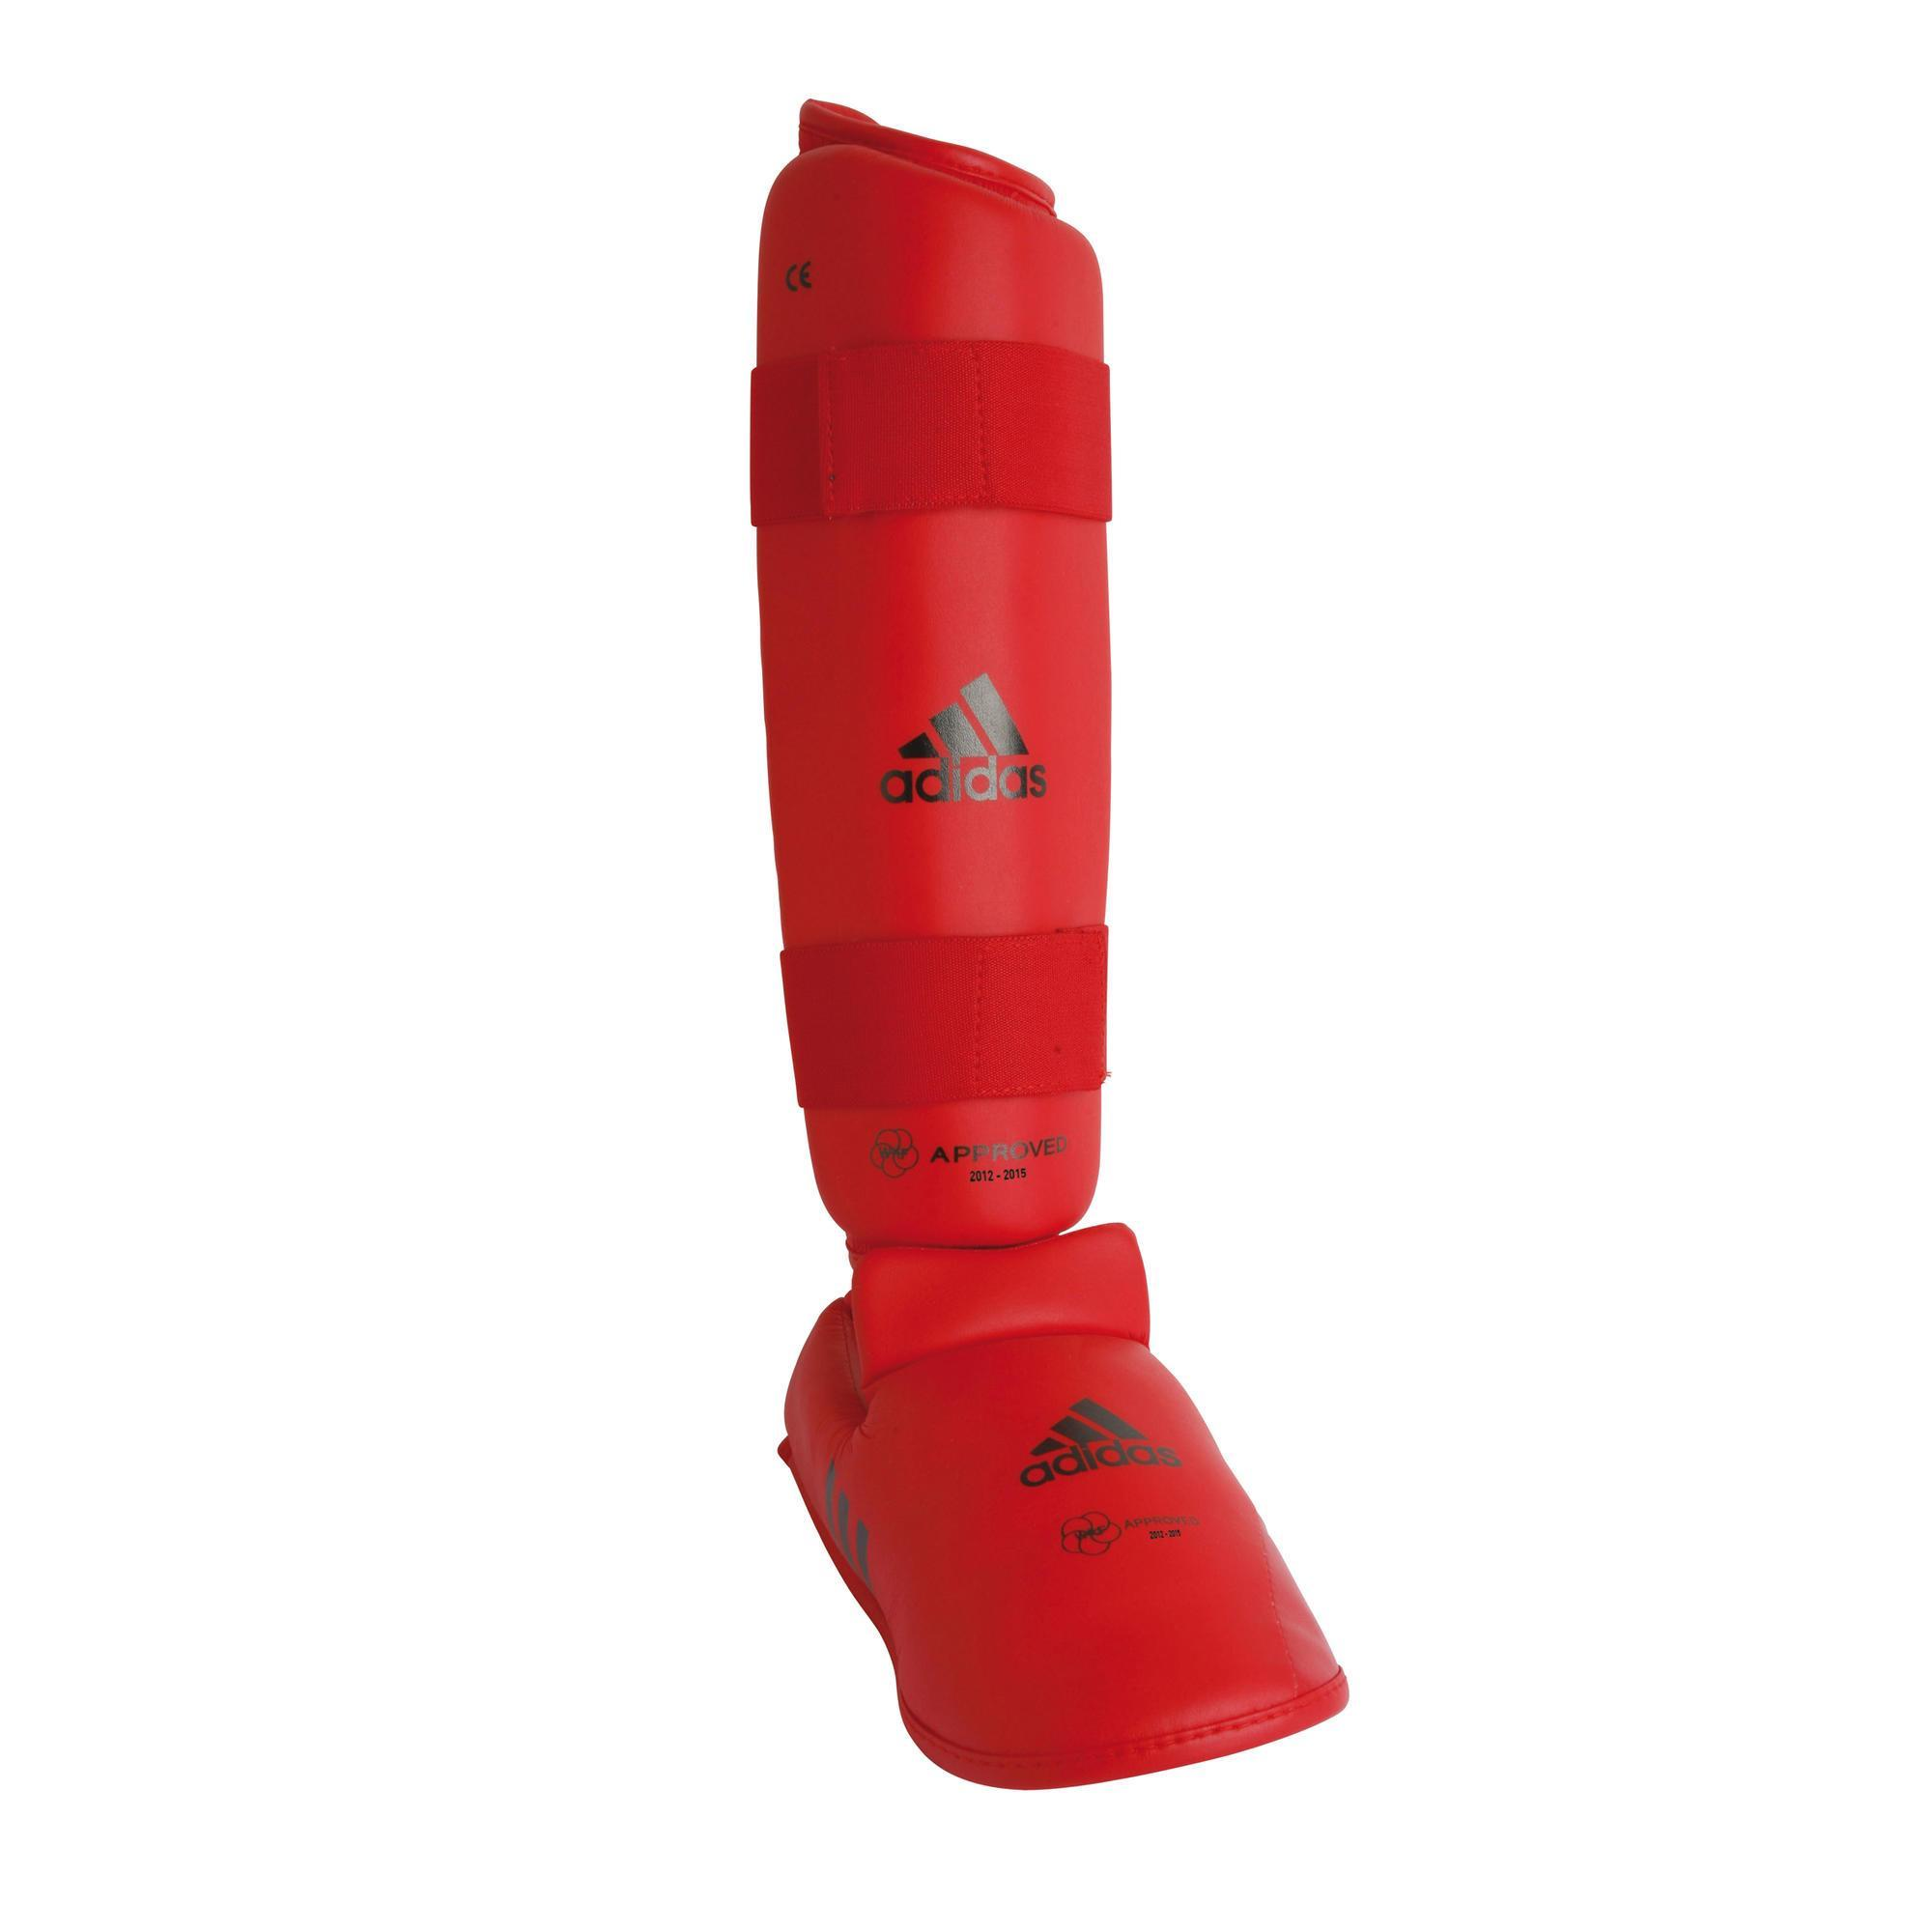 Adidas prot ge tibia et pied de karat rouge decathlon - Protege tibia decathlon ...